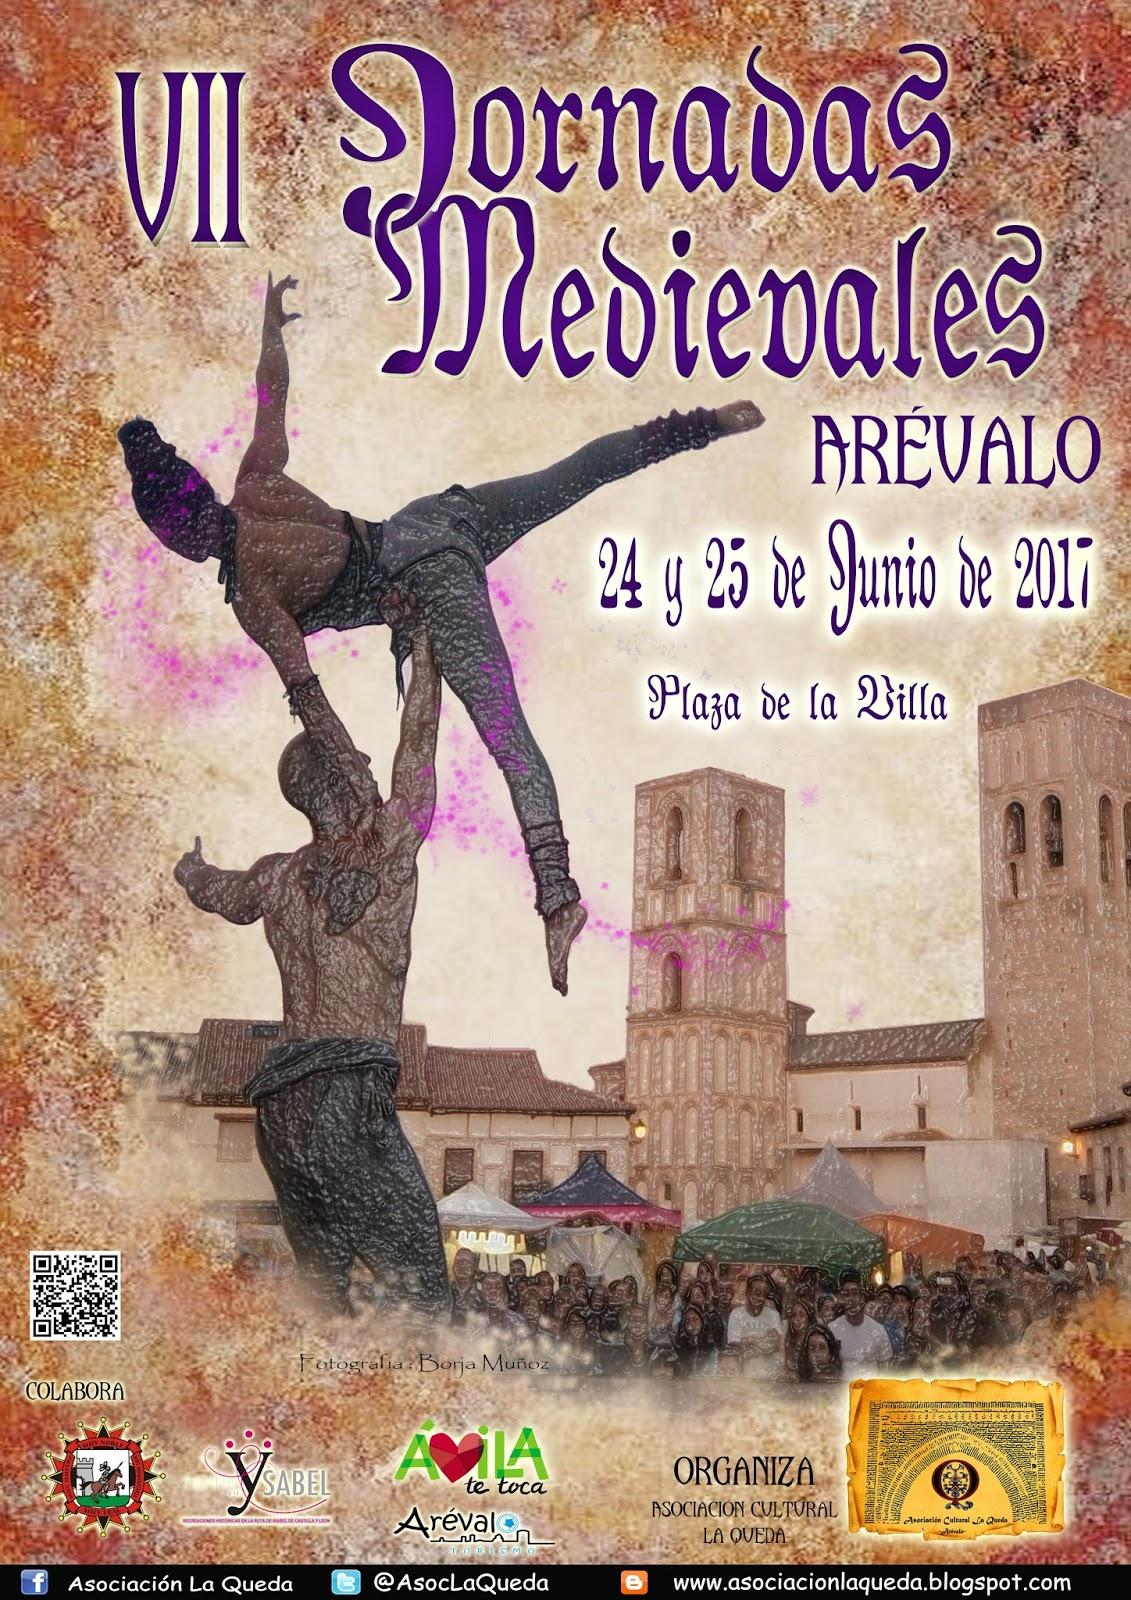 Jornadas medievales en arevalo